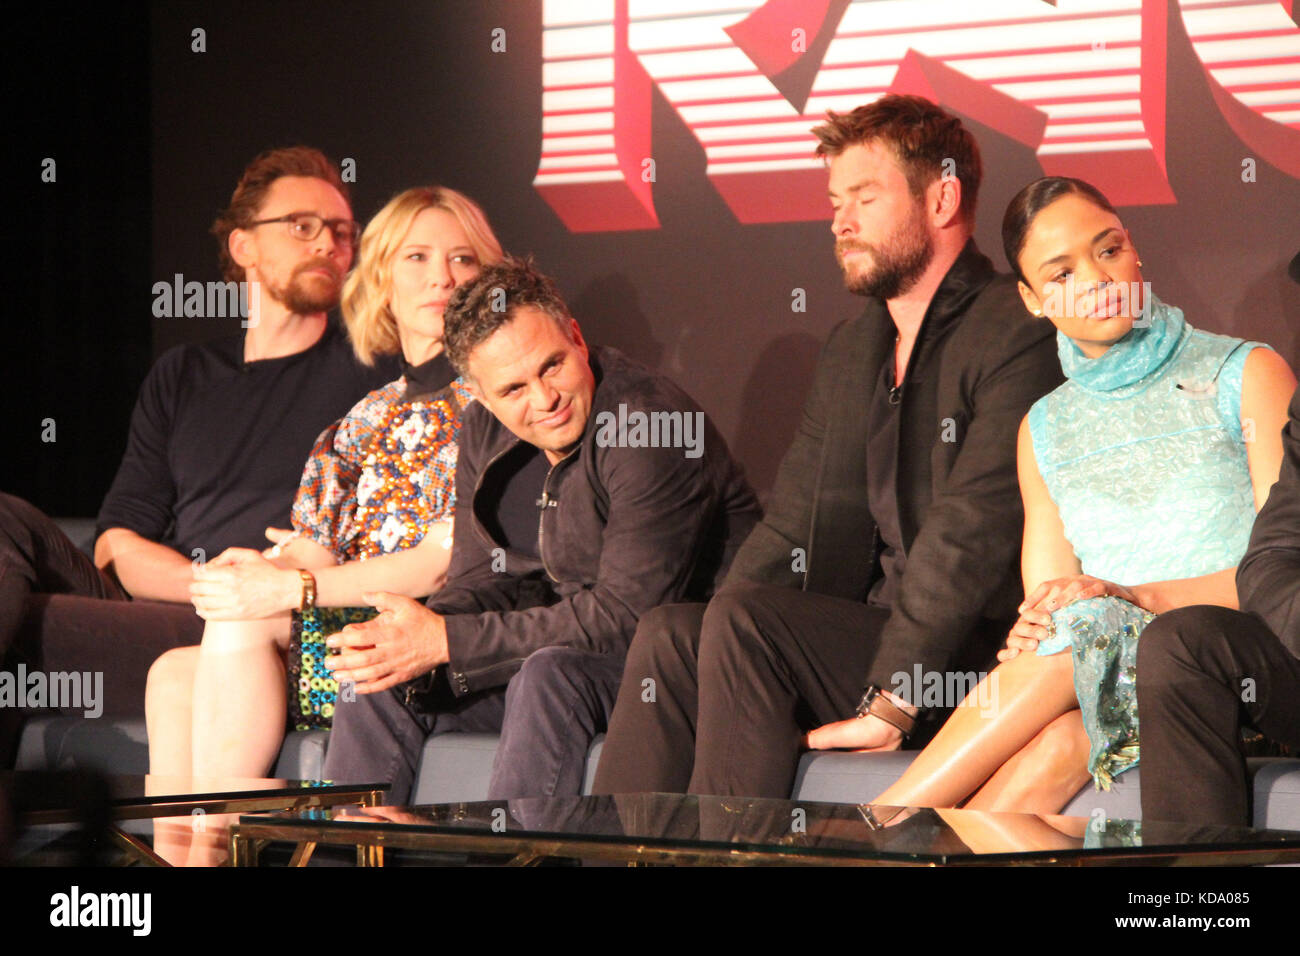 Los Angeles, USA. 11th Oct, 2017. Tom Hiddleston, Cate Blanchett, Mark Ruffalo, Chris Hemsworth, Tessa Thompson - Stock Image